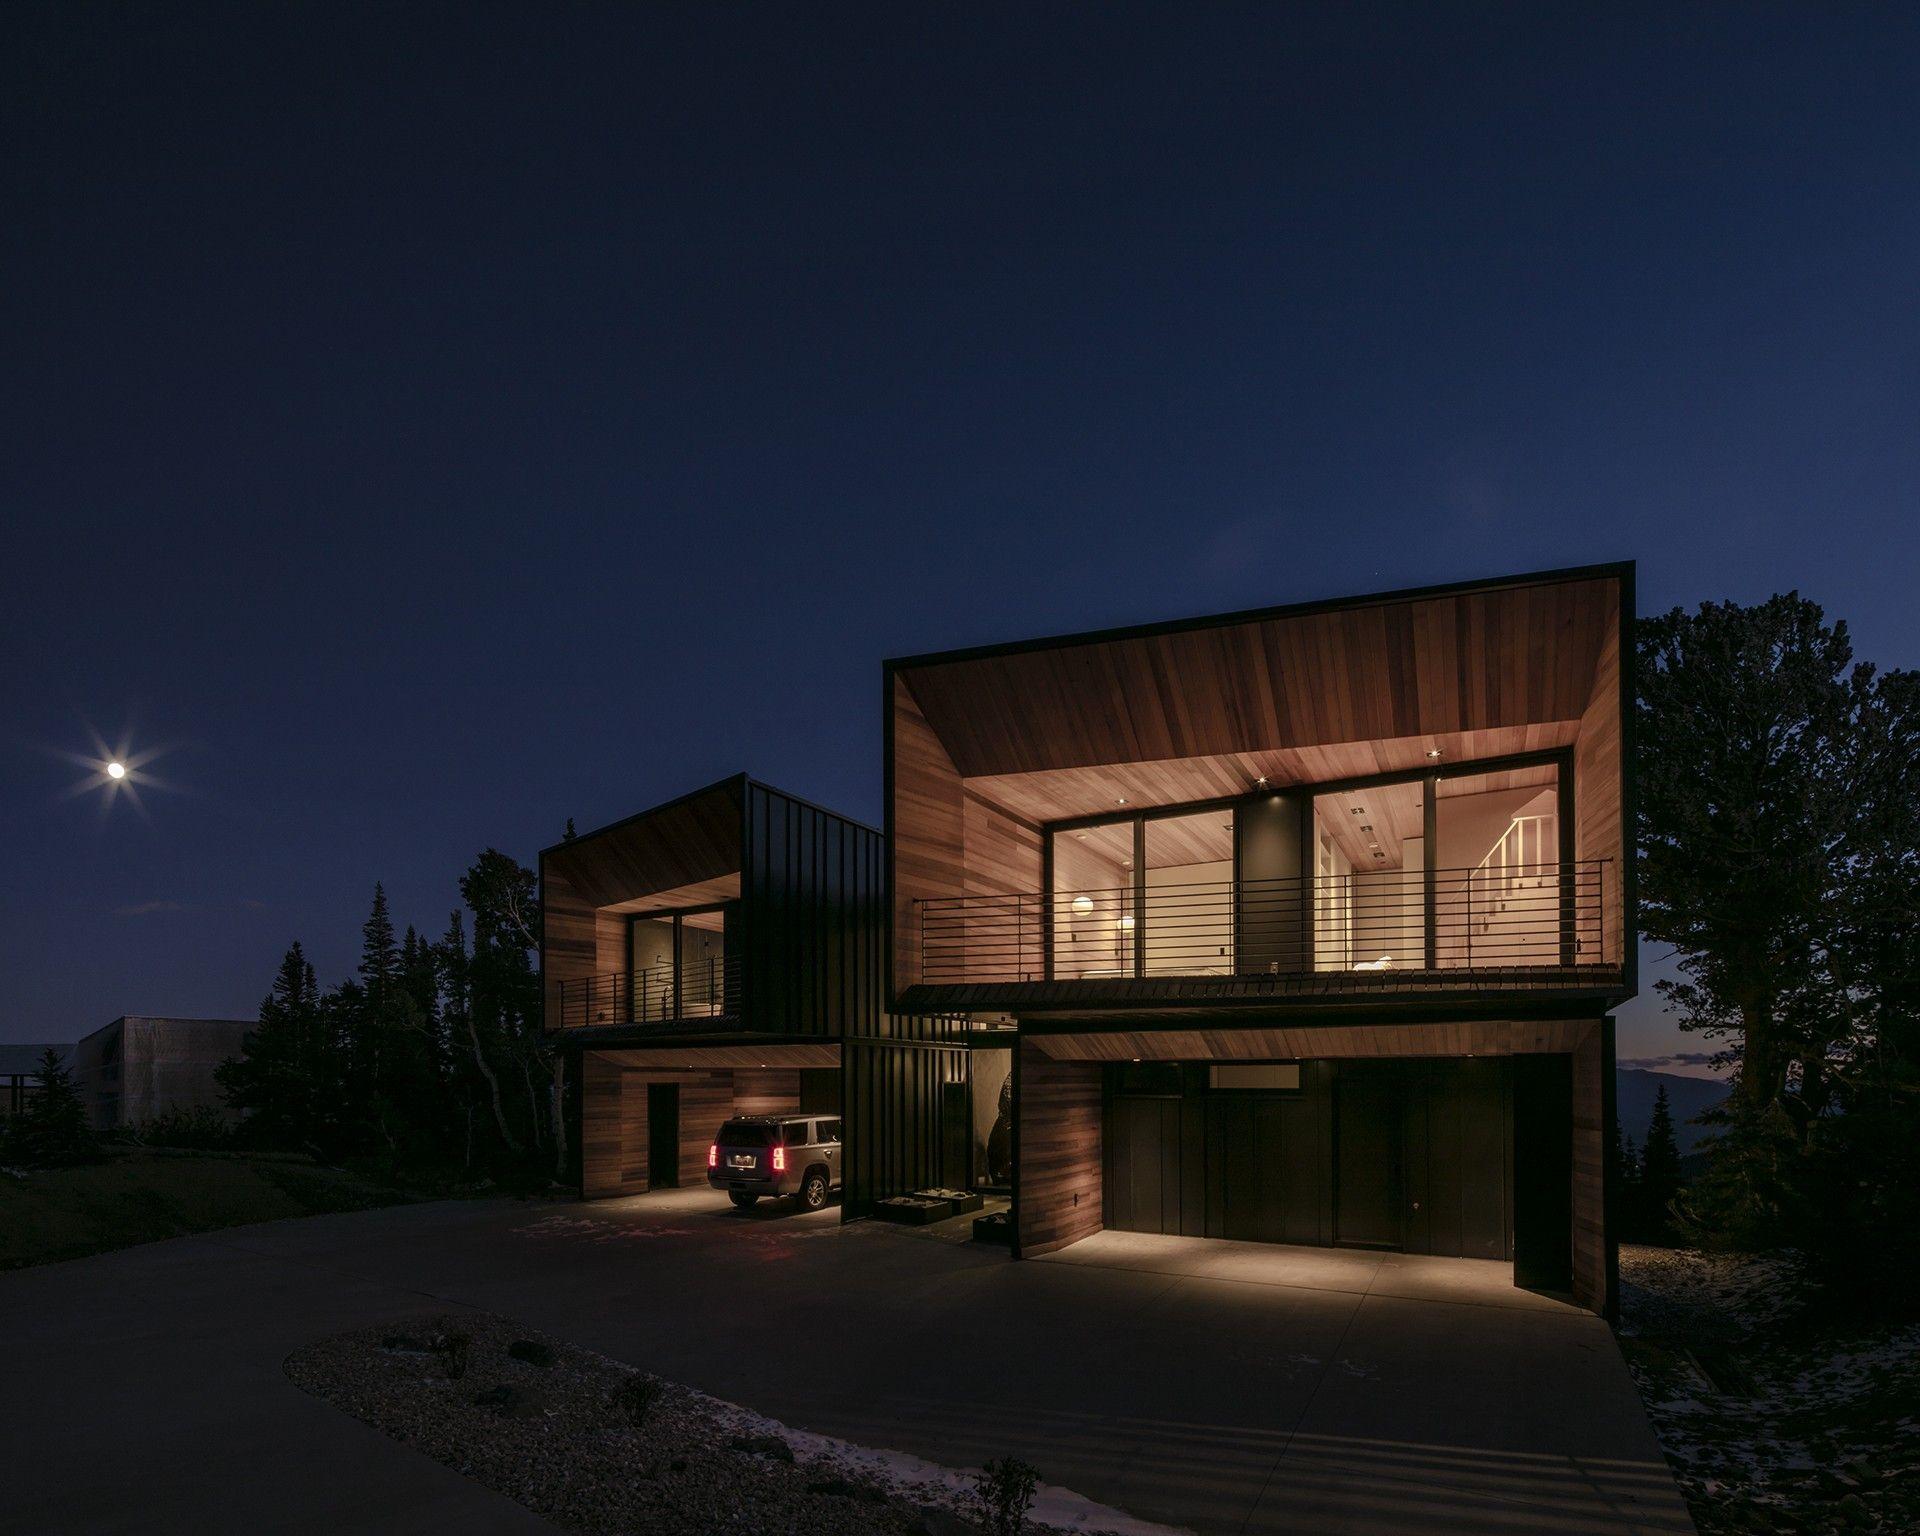 The Kinii The Falcon S Nest By The Italian Architects Of Obicua Nel 2020